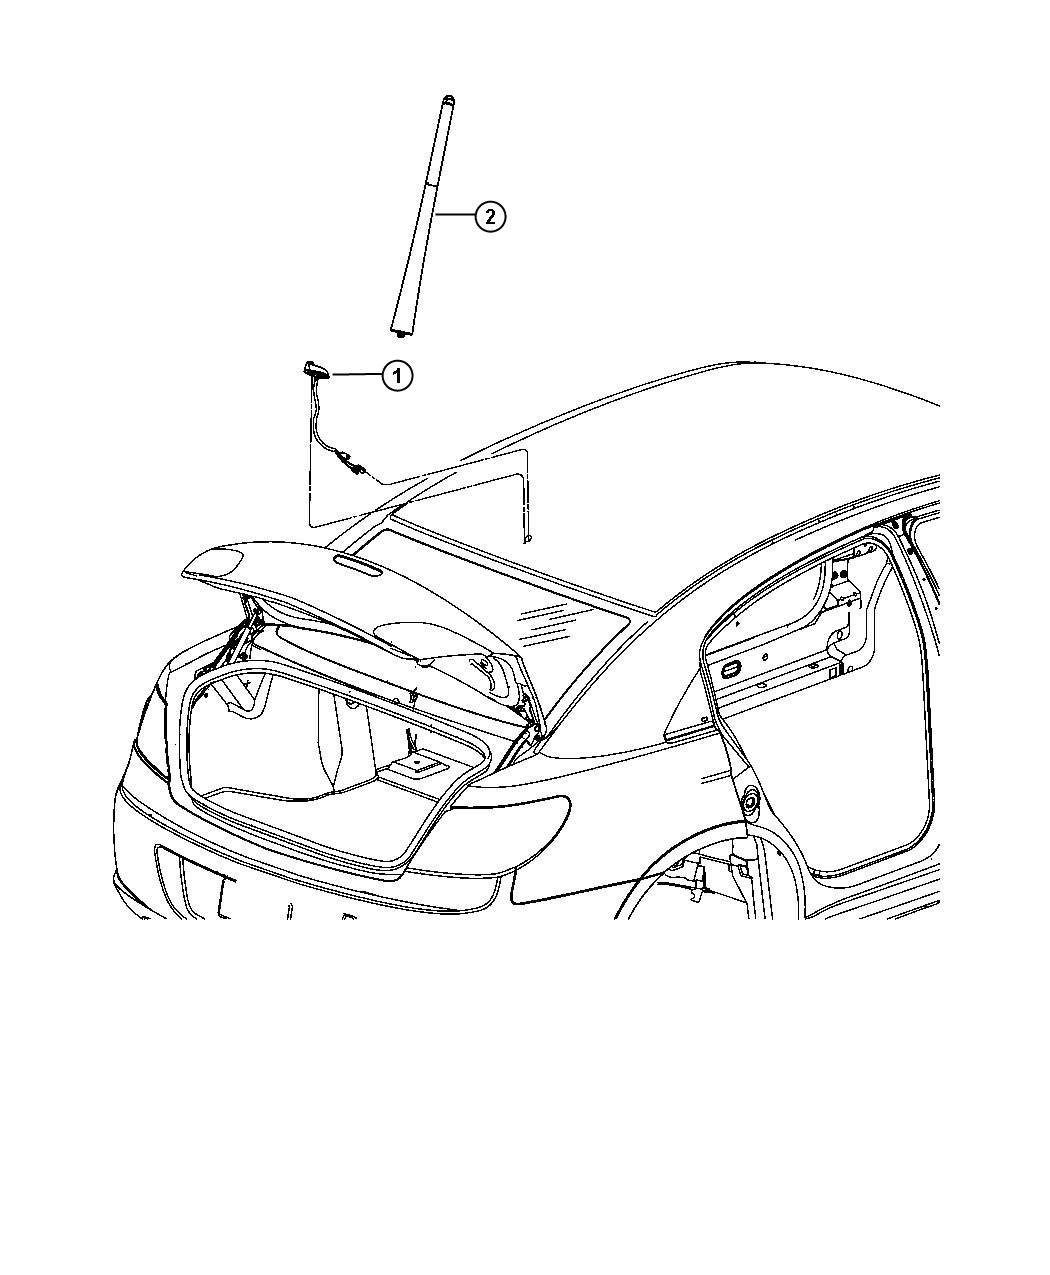 2008 Dodge Avenger Mast. Antenna. [removable short mast